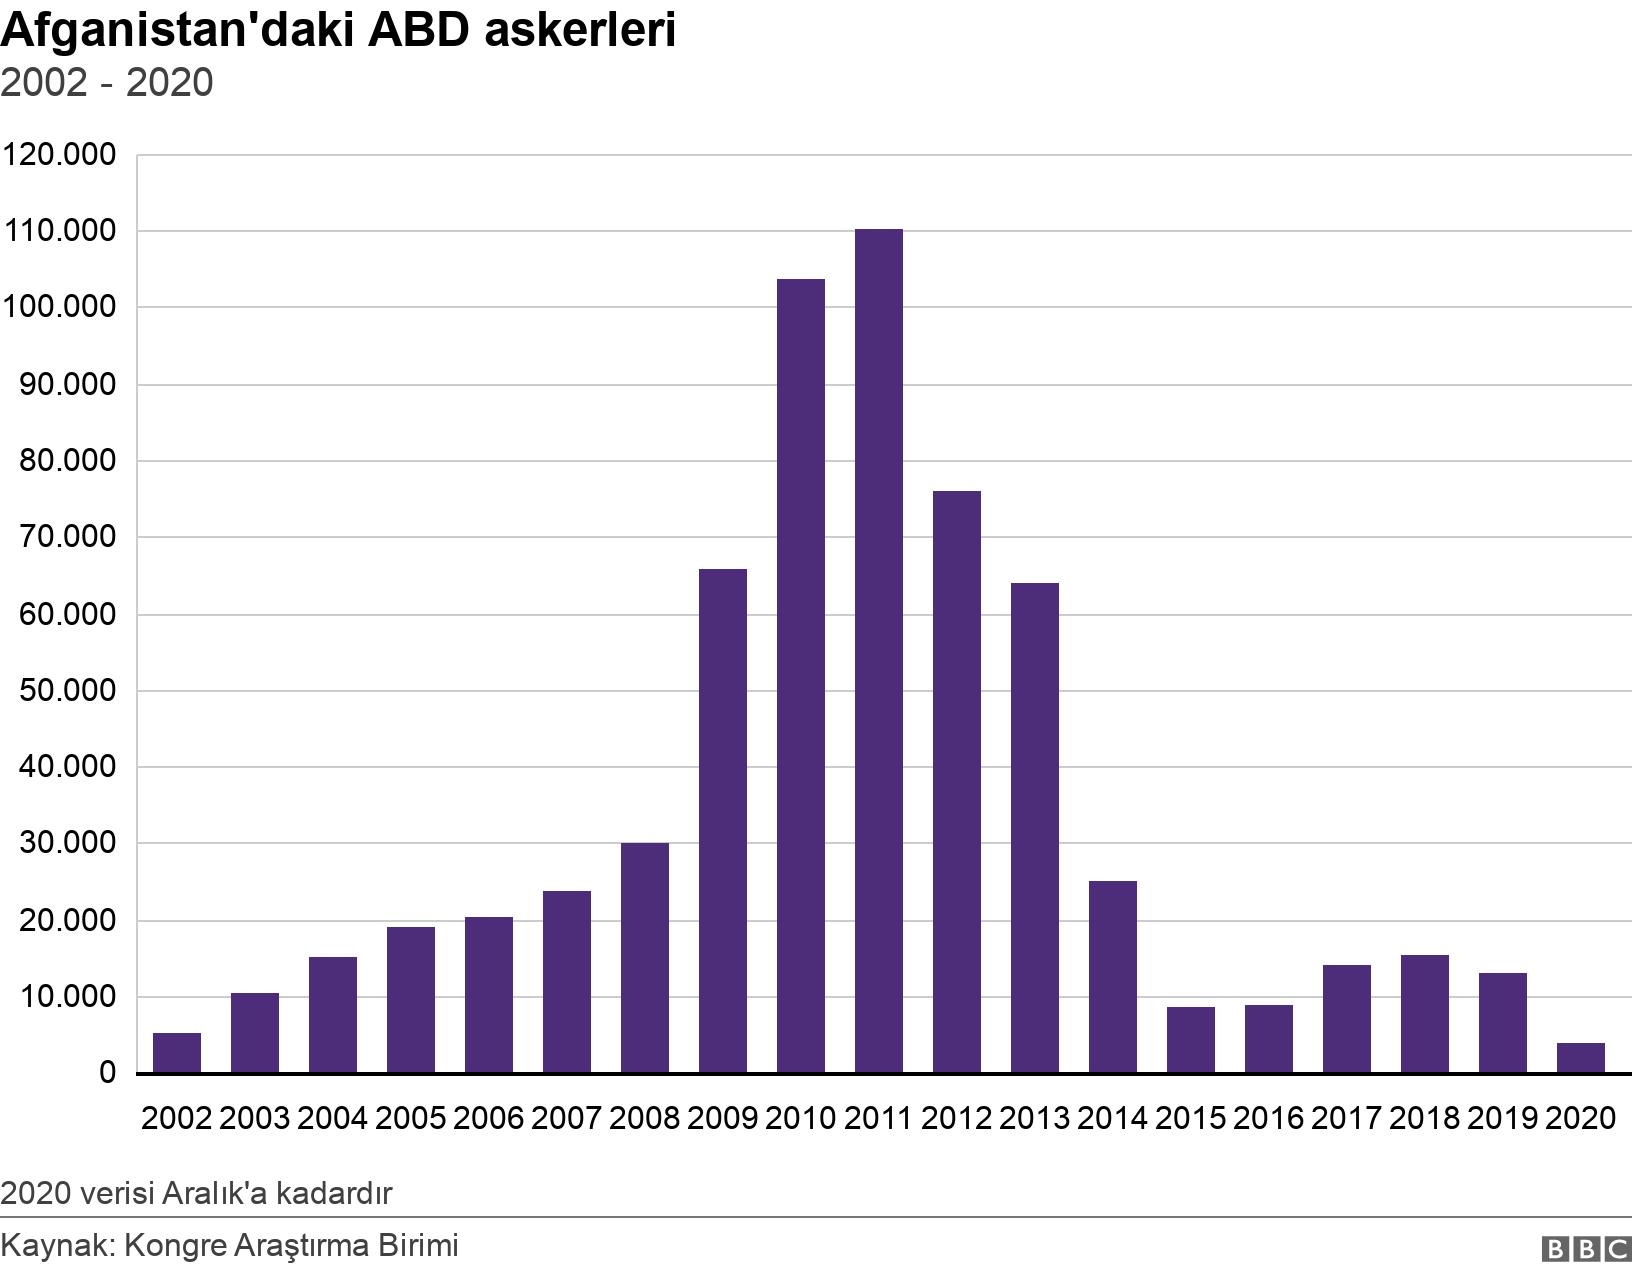 Afganistan'daki ABD askerleri. 2002 - 2020. Chart showing US troop levels in Afghanistan from 2002 to 2019 2020 verisi Aralık'a kadardır.